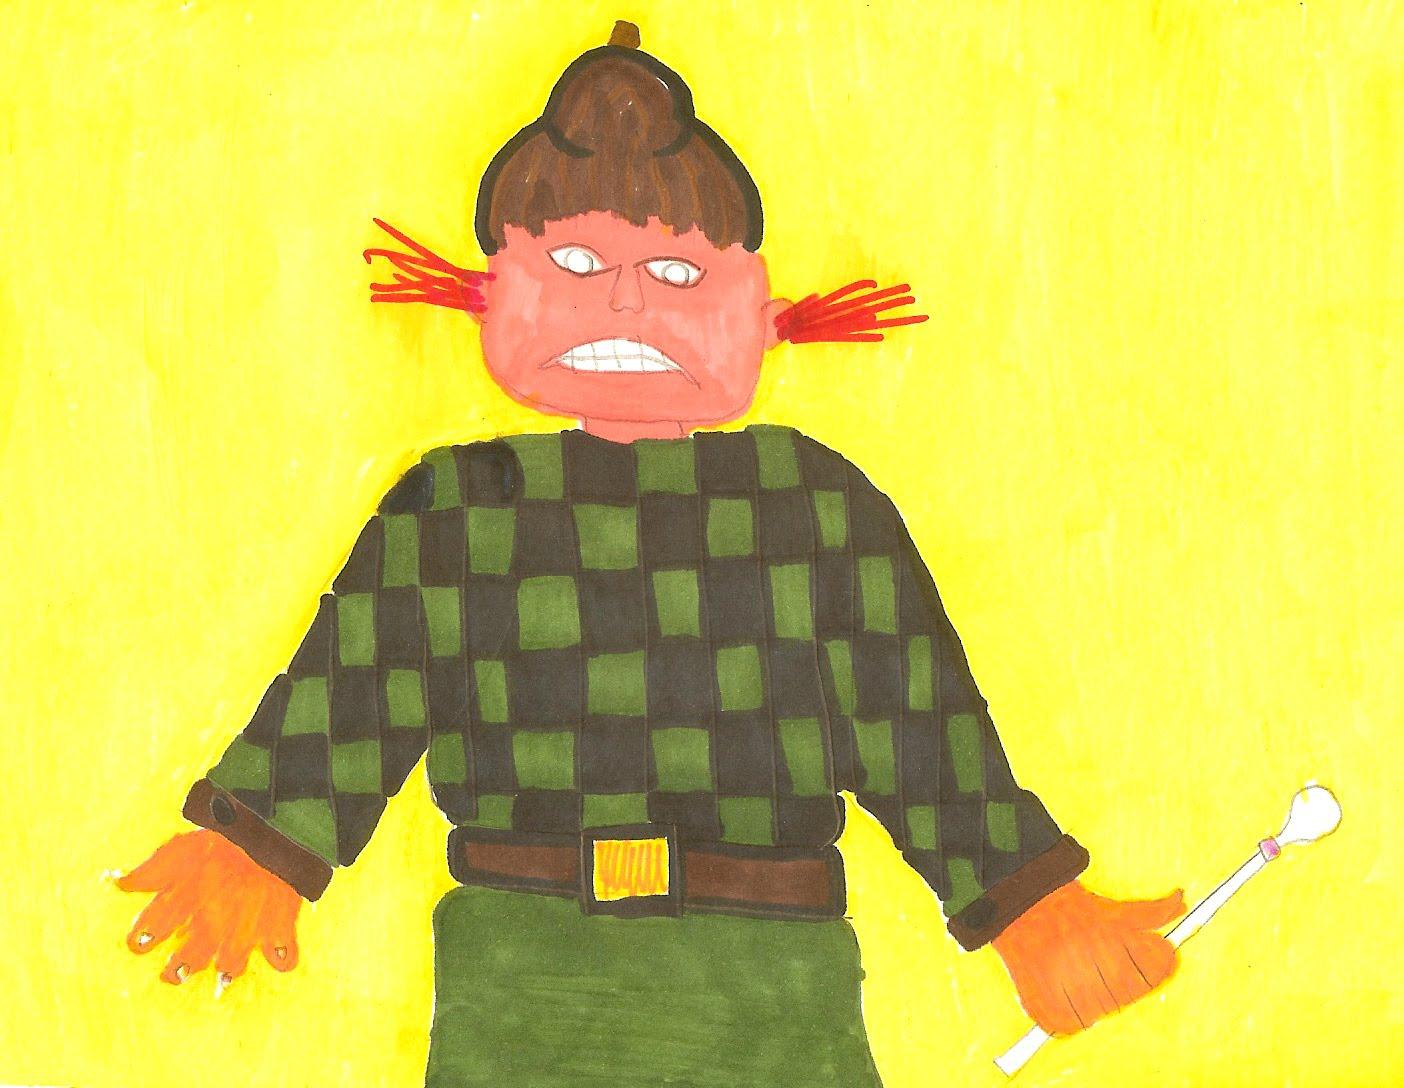 http://1.bp.blogspot.com/_TPrqKnzCulM/THiL0eNdvxI/AAAAAAAAASc/iM0Gk5W-xVg/s1600/angry_ears.jpg